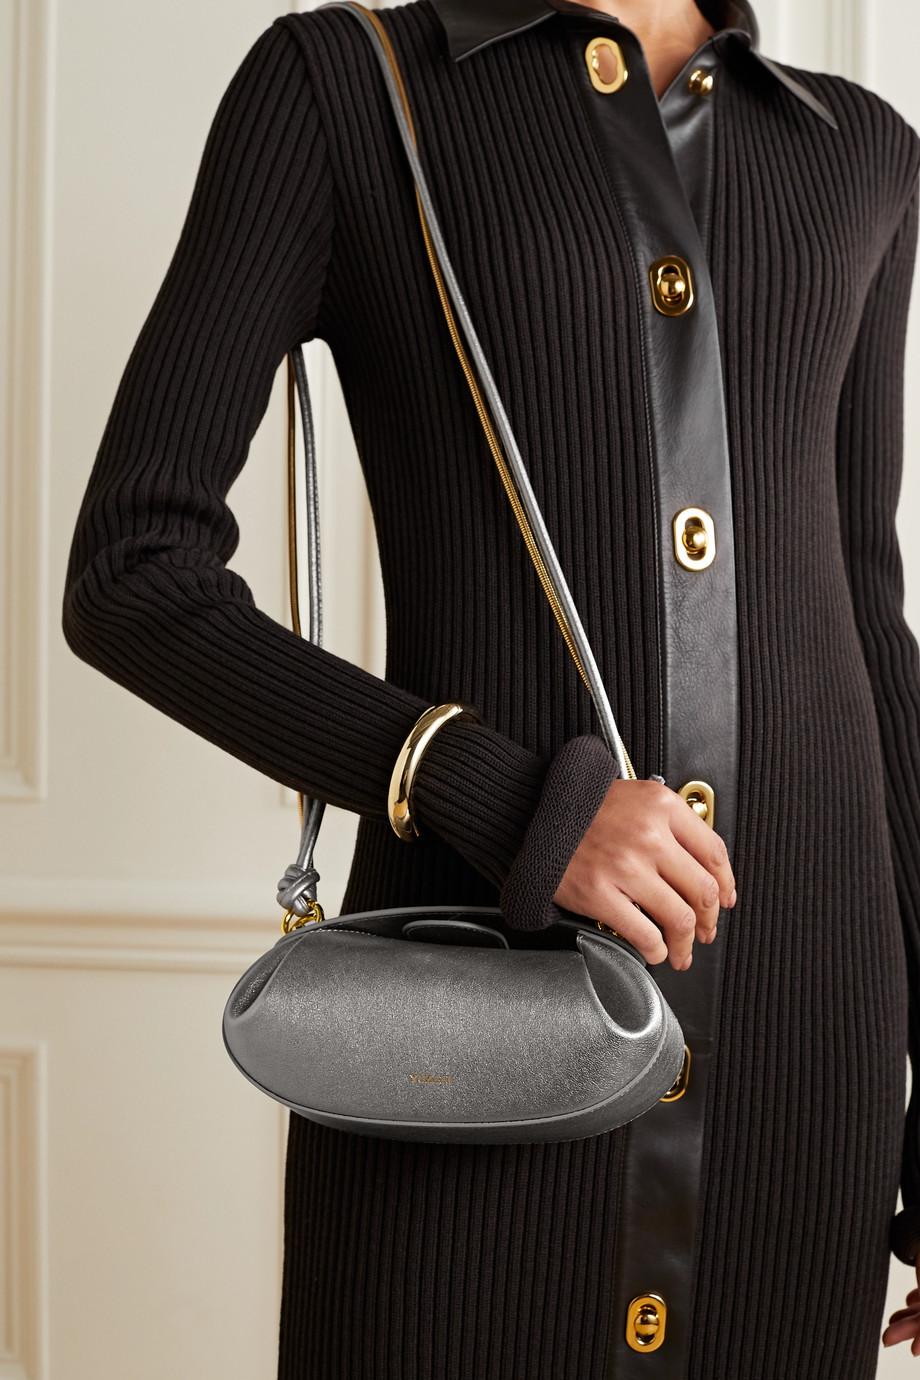 Yuzefi Dinner Roll metallic leather shoulder bag